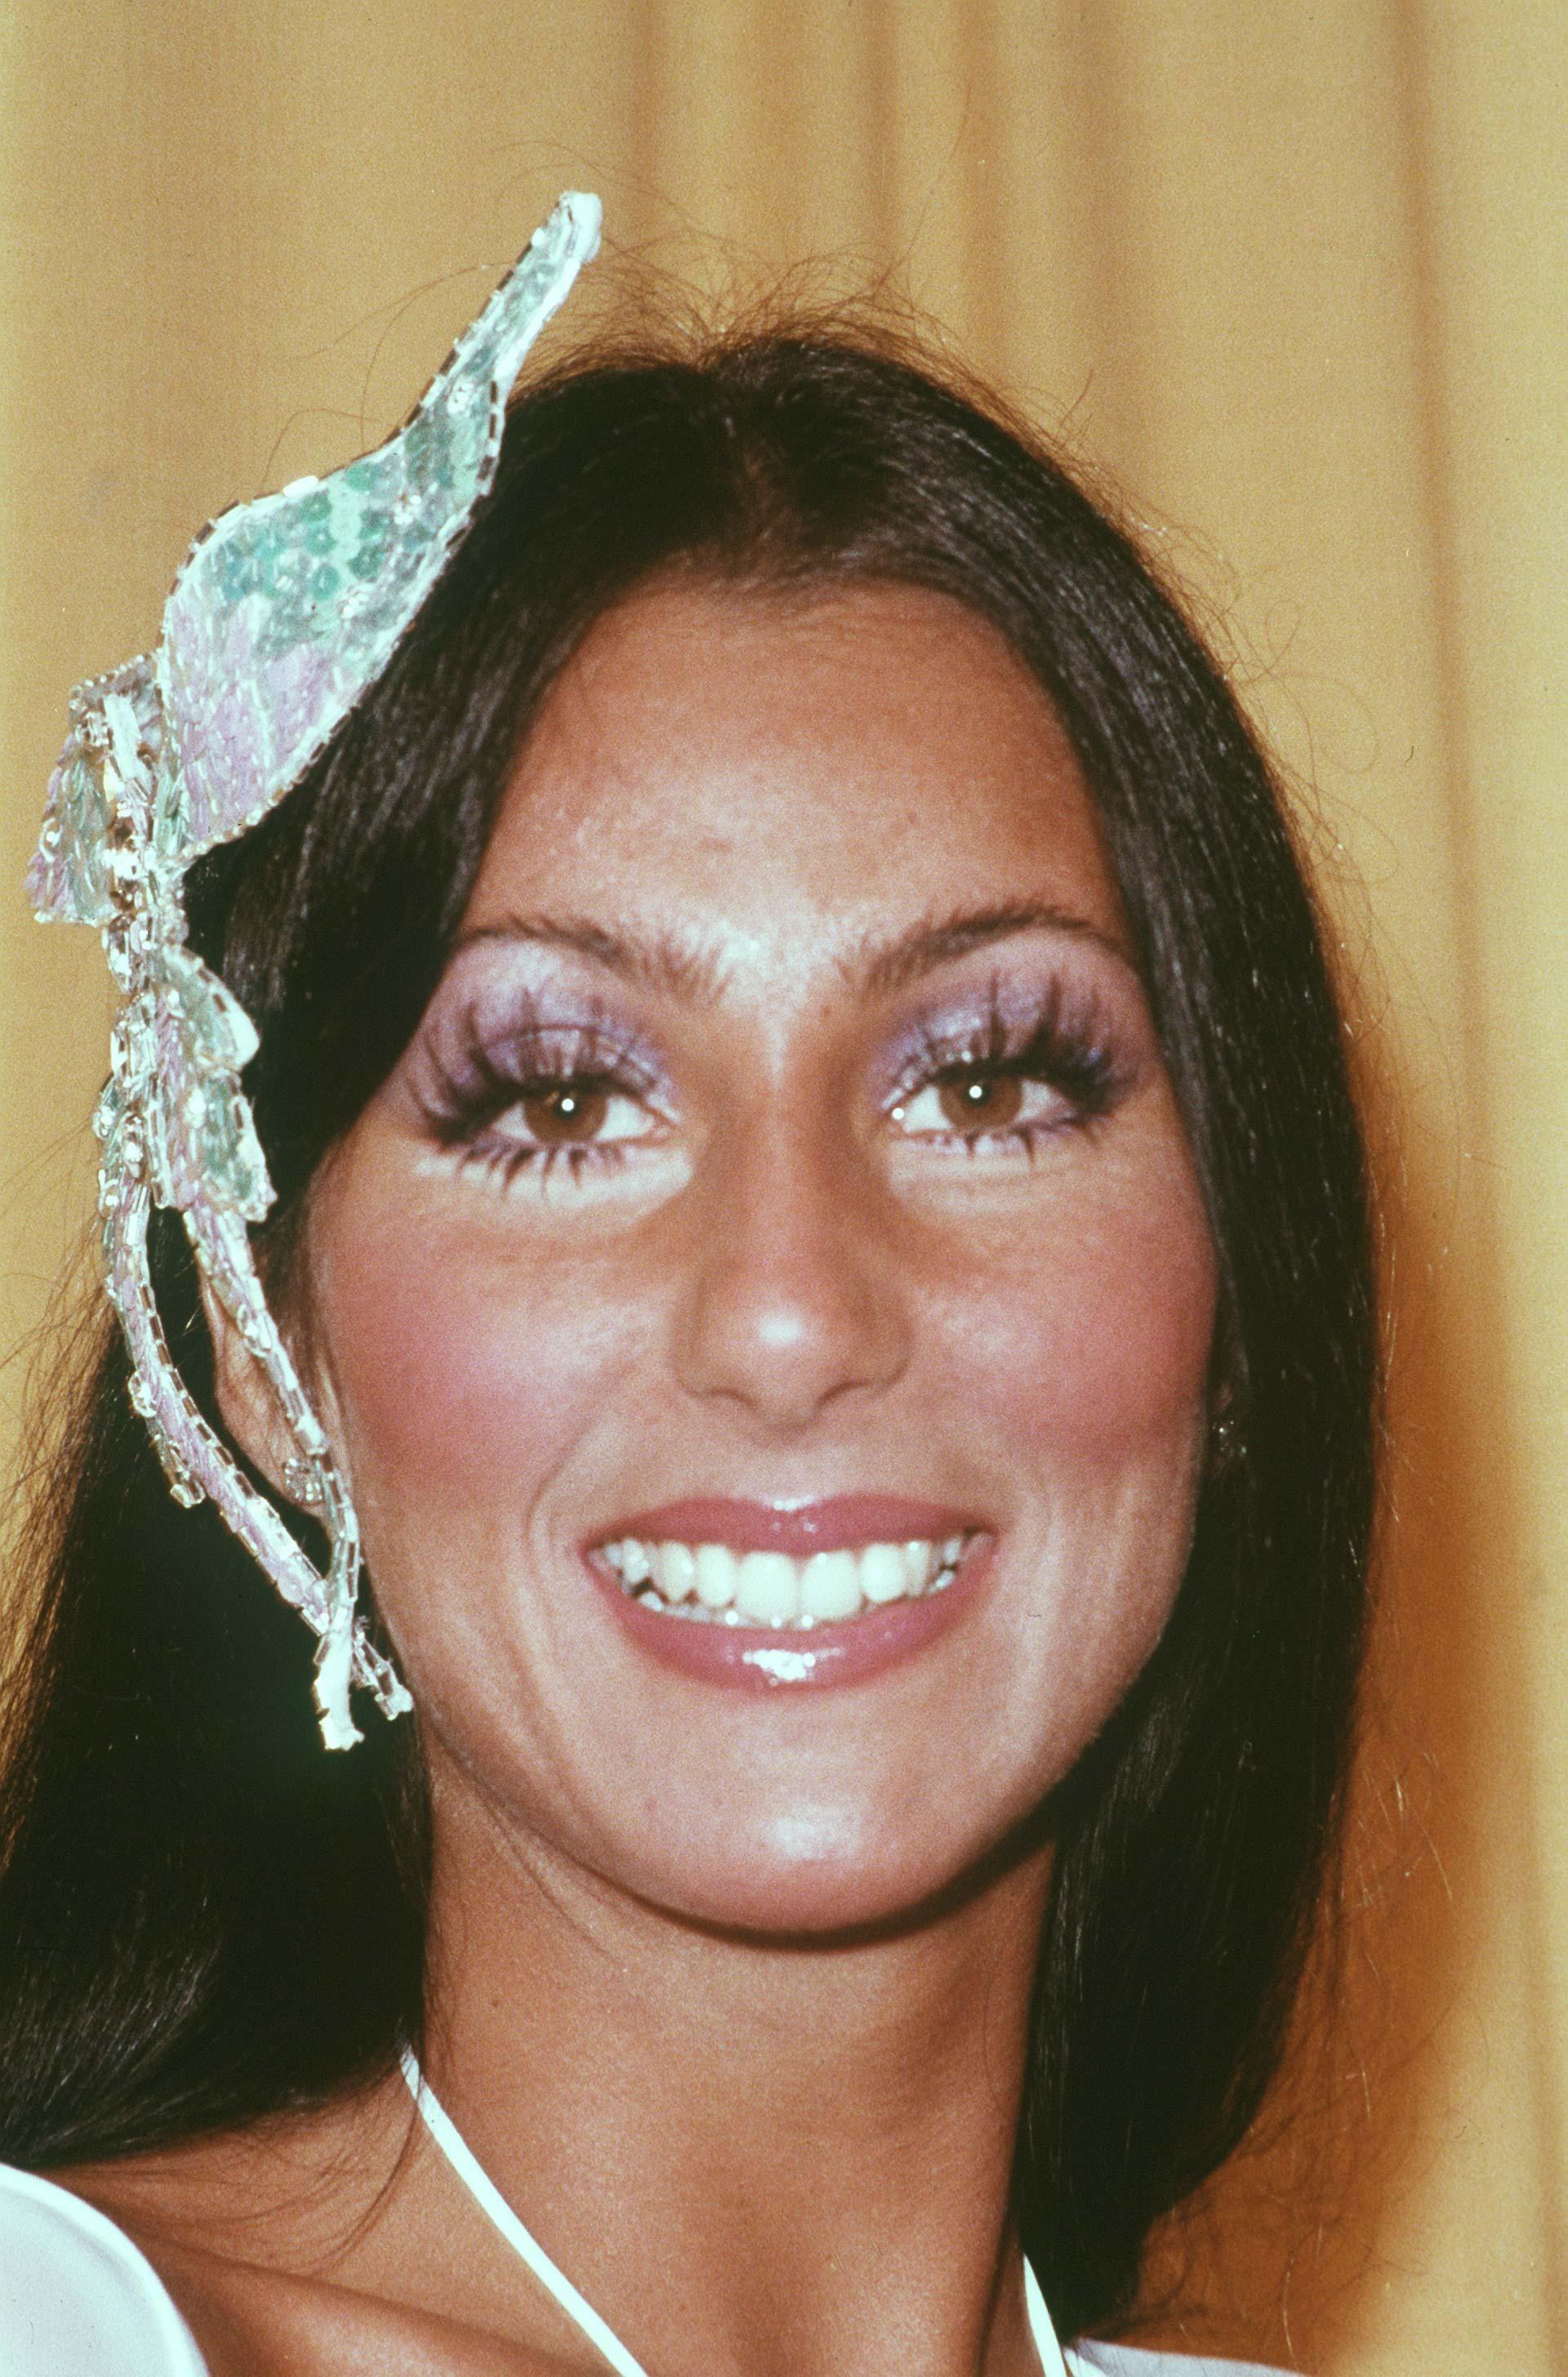 Fotos De Cher 1970's grammy awards - cher in 2019   disco makeup, 70s